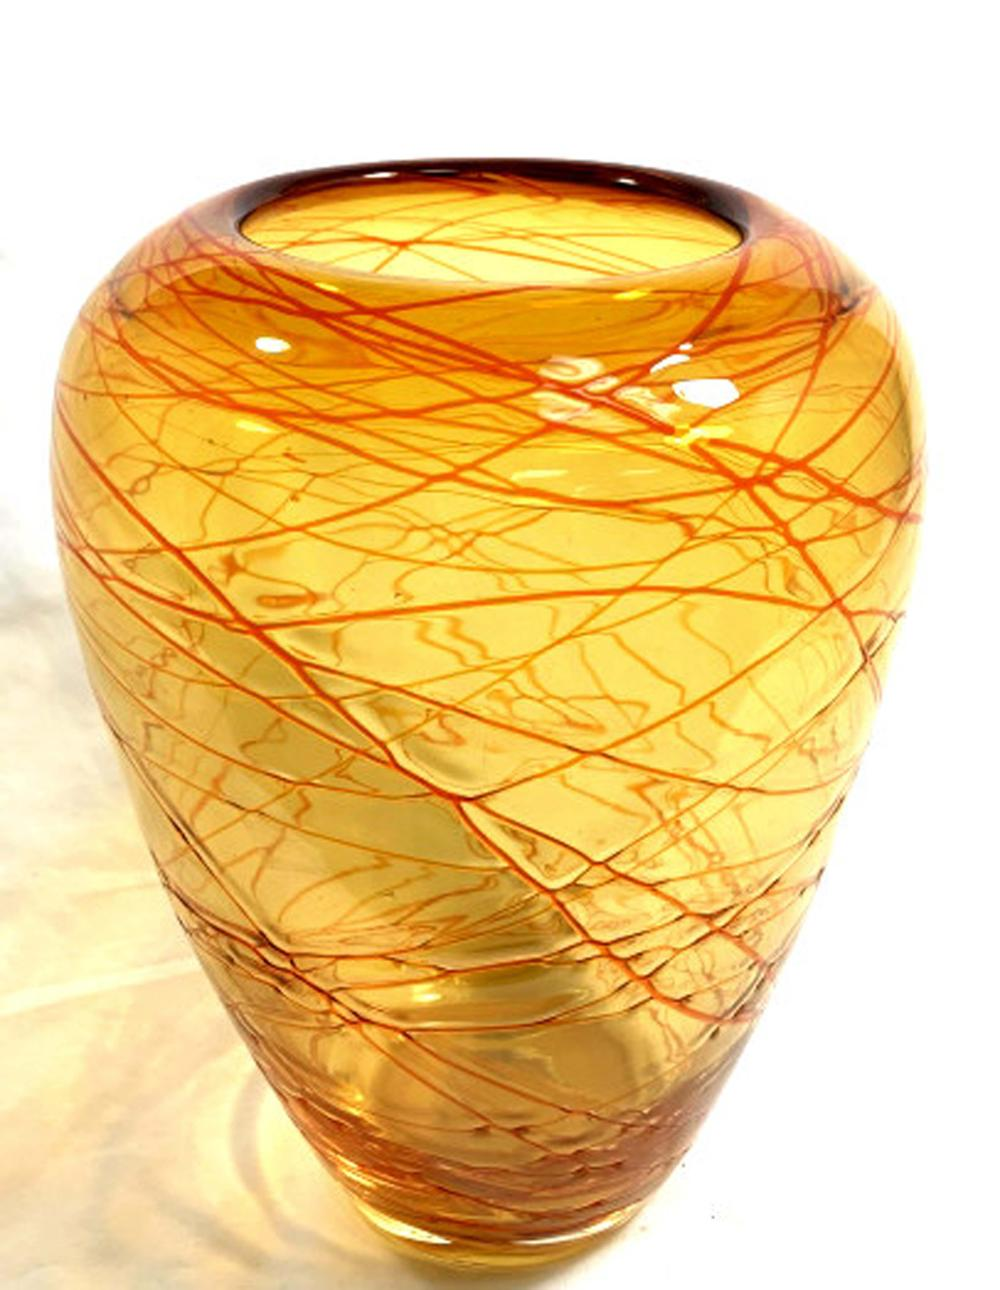 Lot 63: ABSTRACT ORANGE SWIRLING LINES ART GLASS VASE